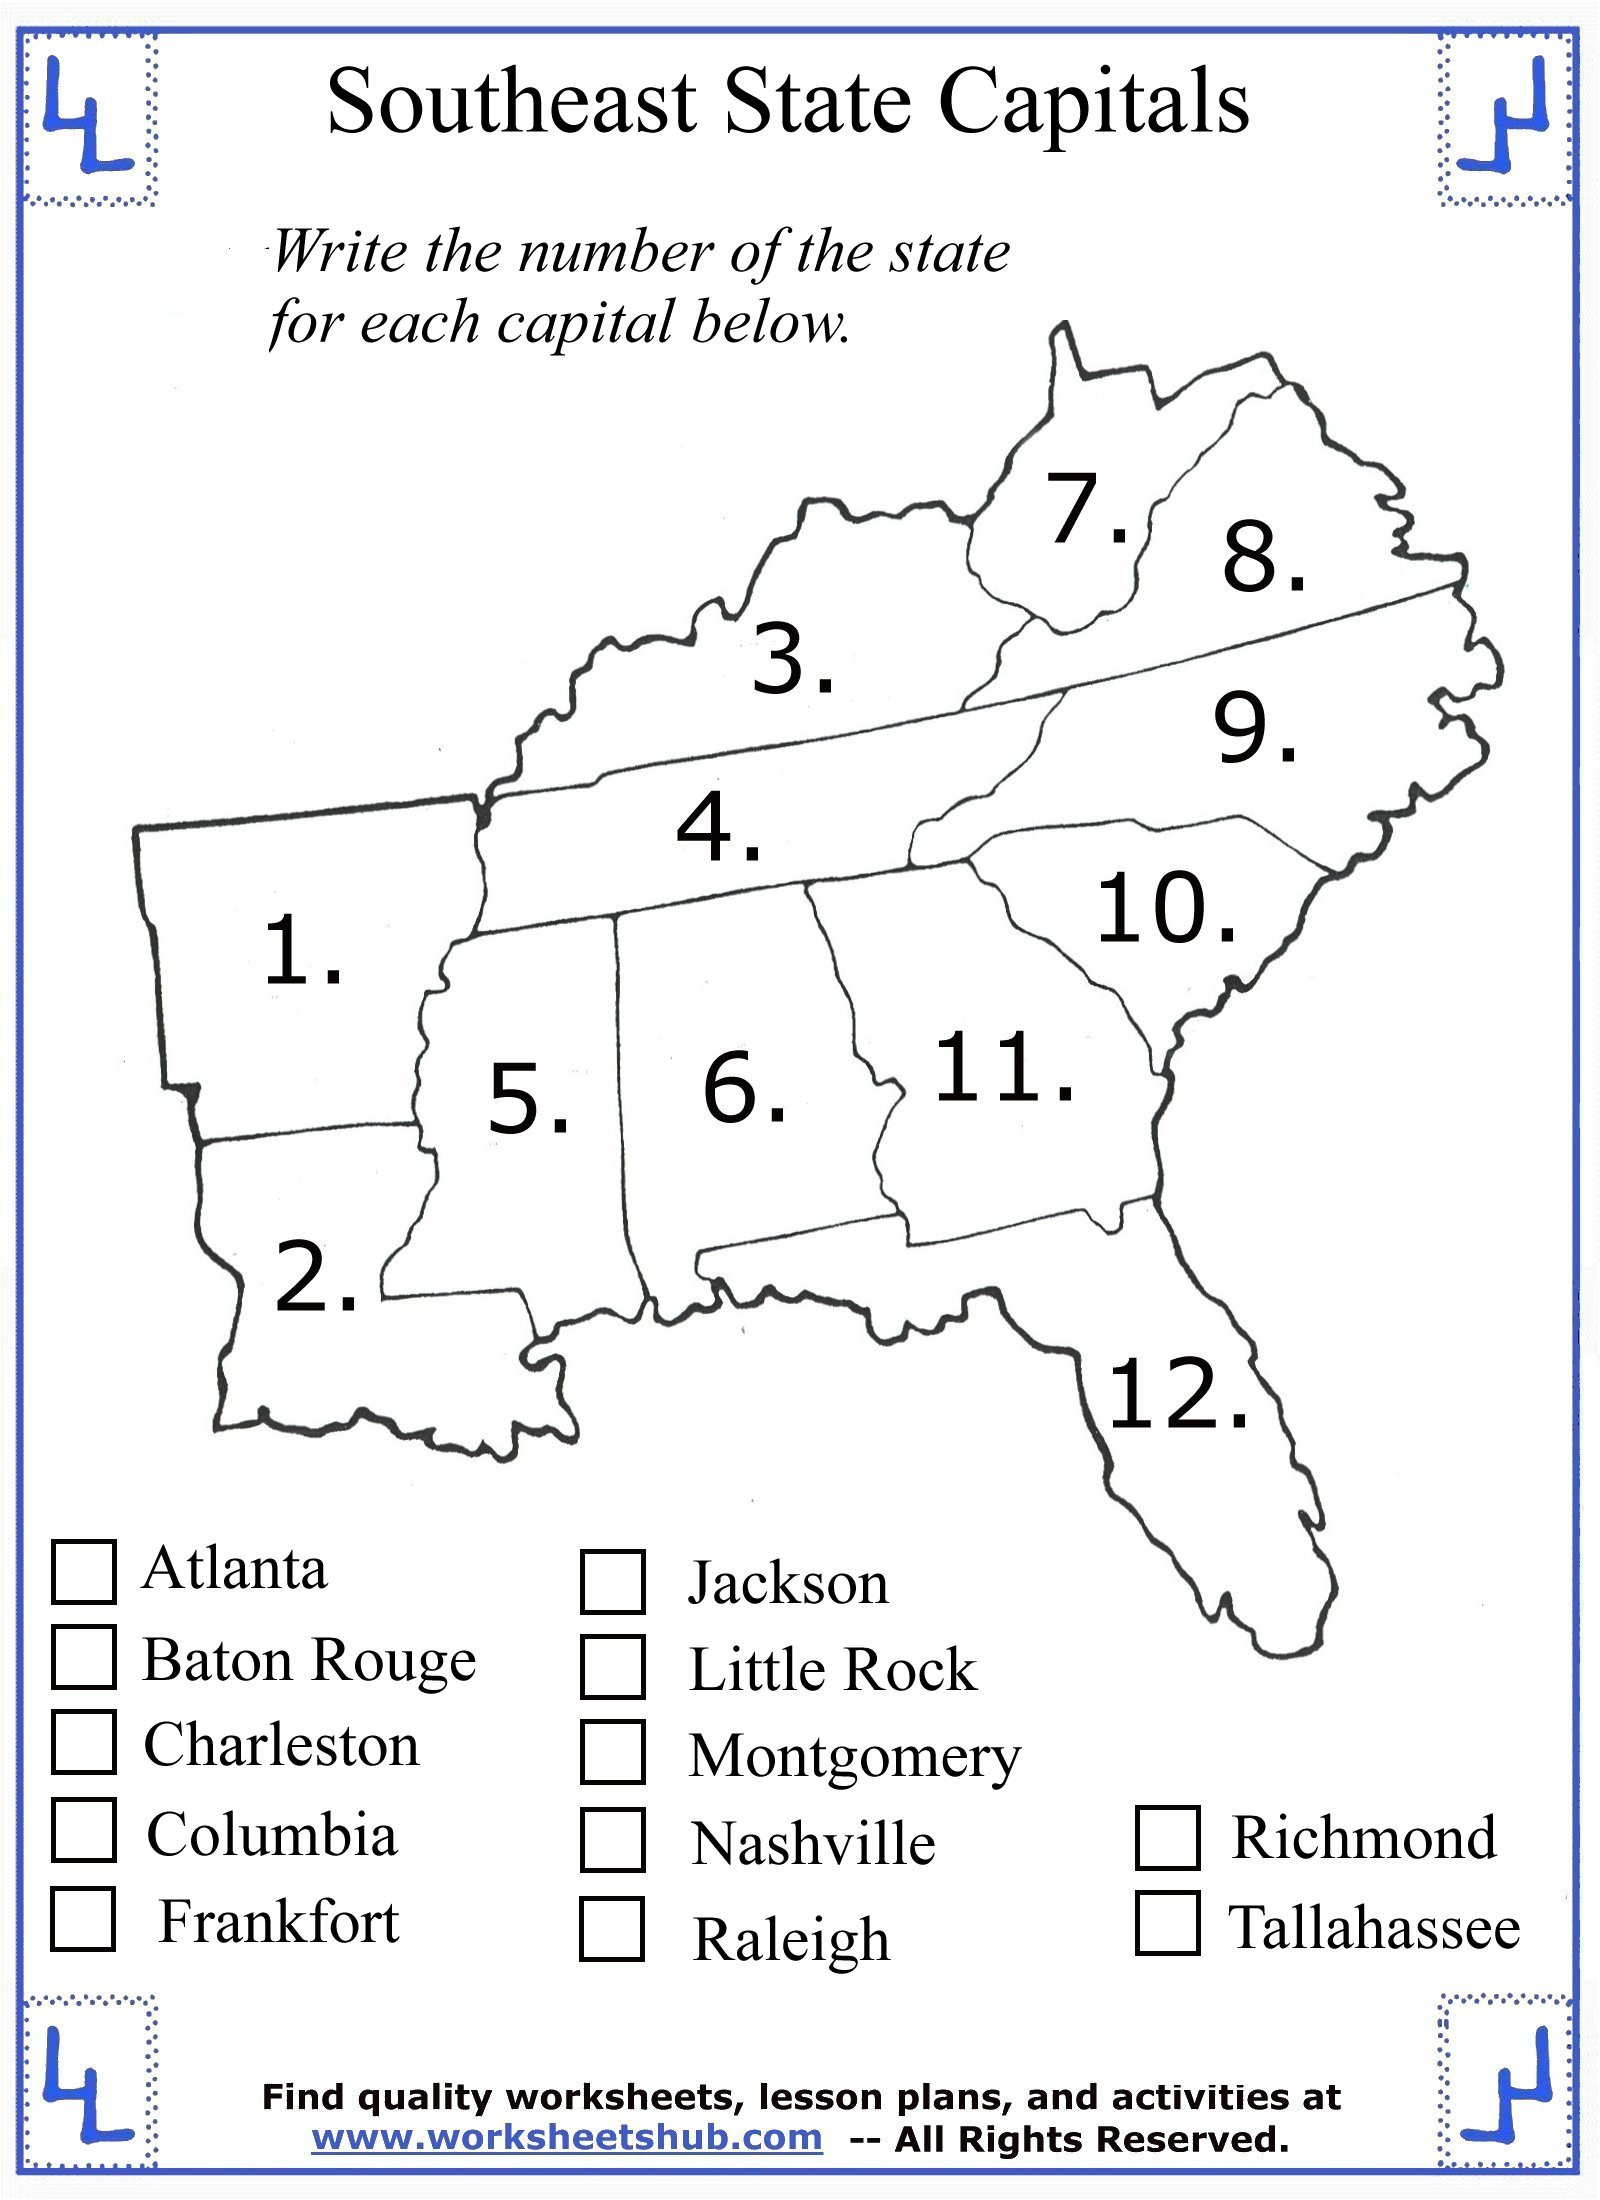 First Grade History Worksheets 4th Grade social Stu S southeast Region States